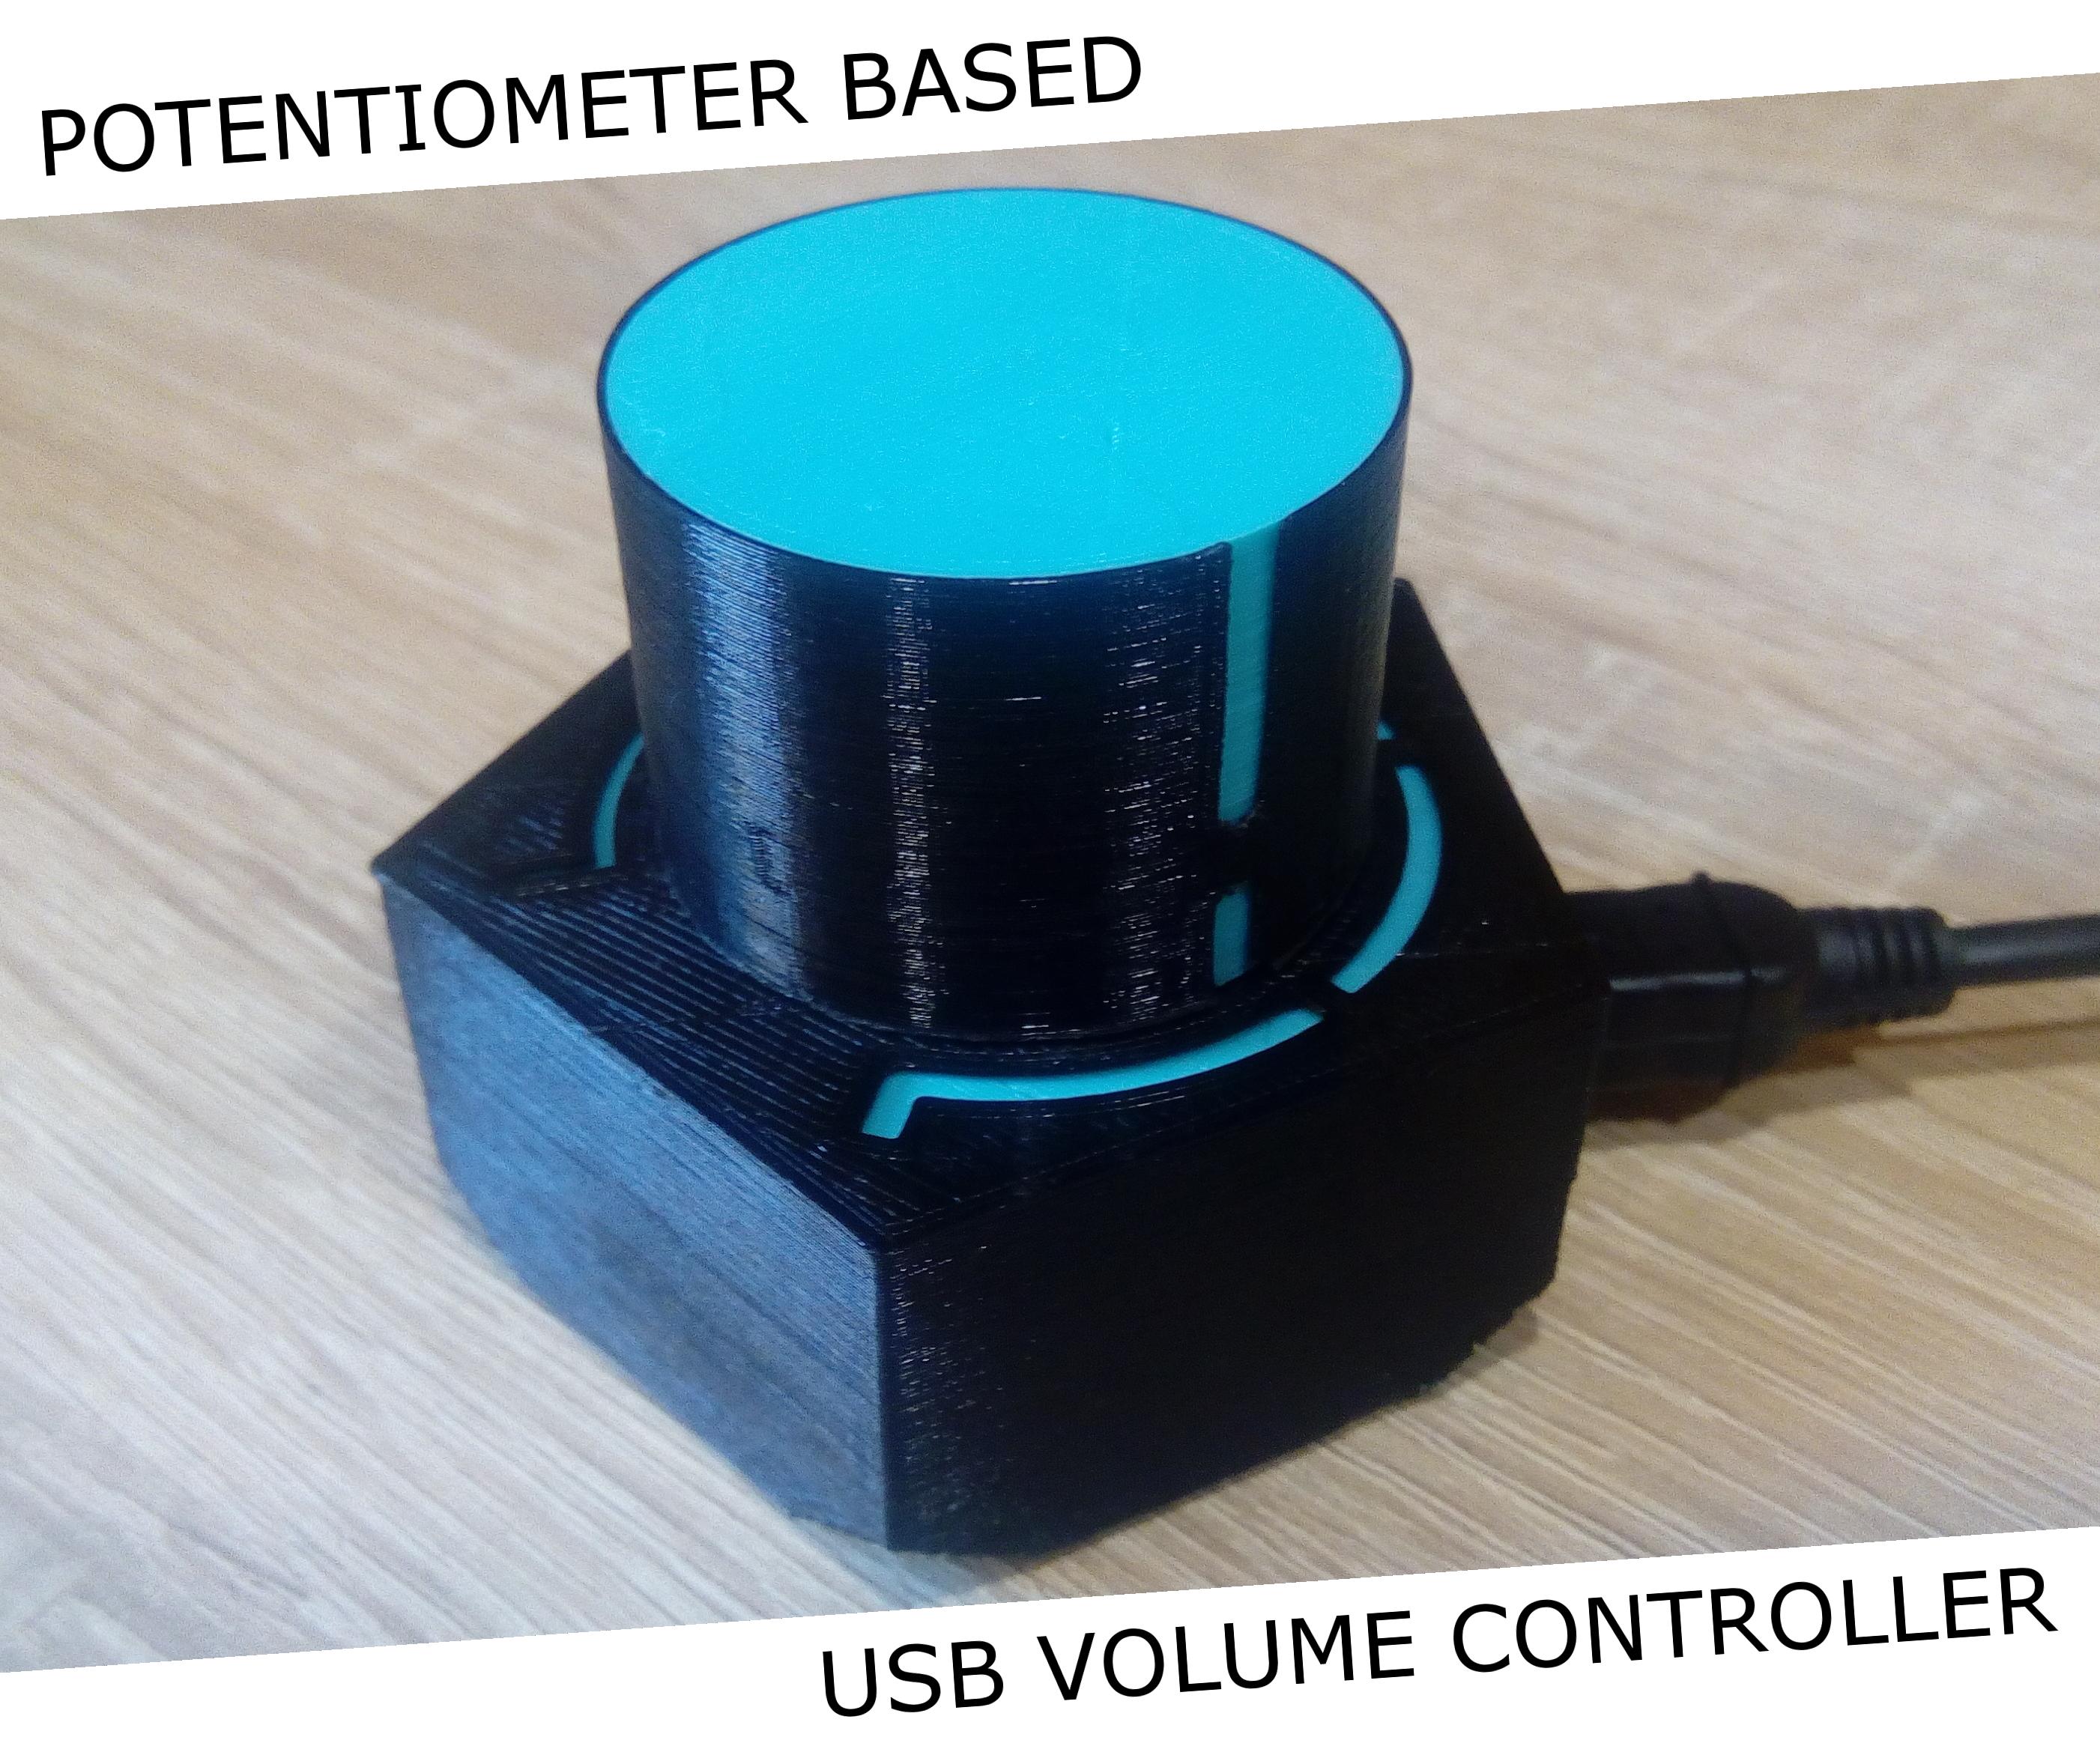 USB Volume Controller - Potentiometer Based